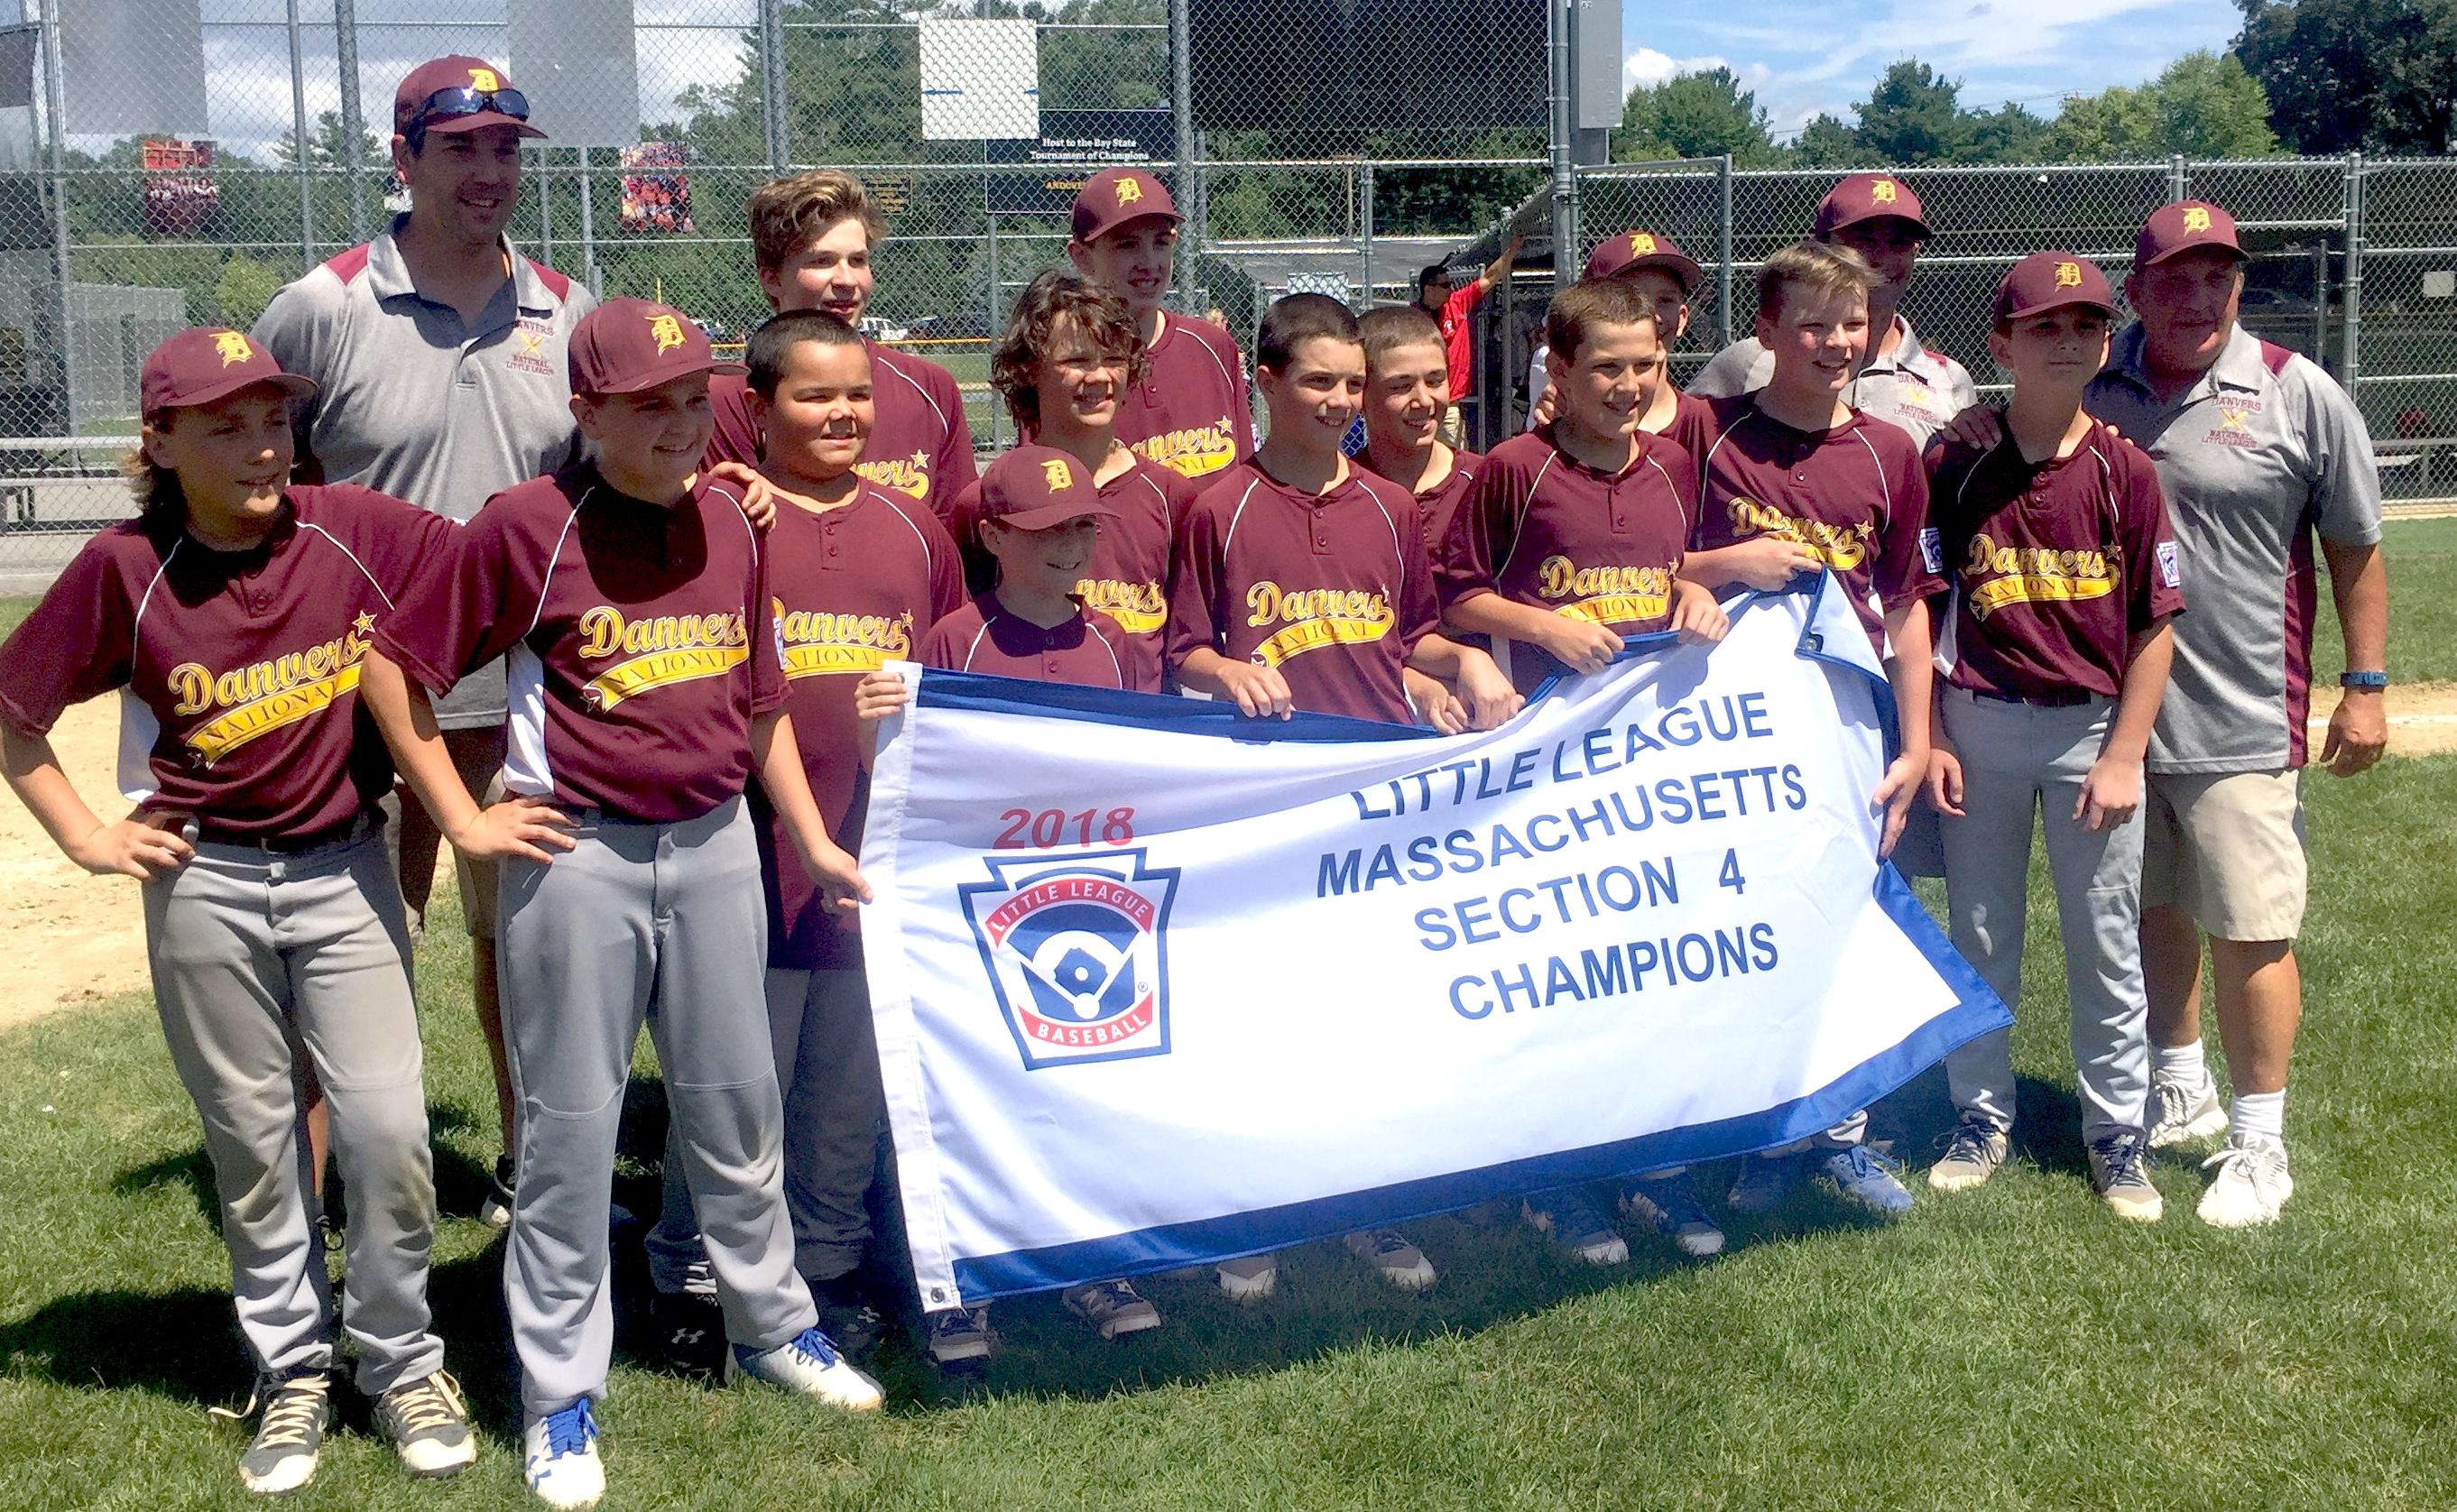 24f1b0810 Danvers National Little League